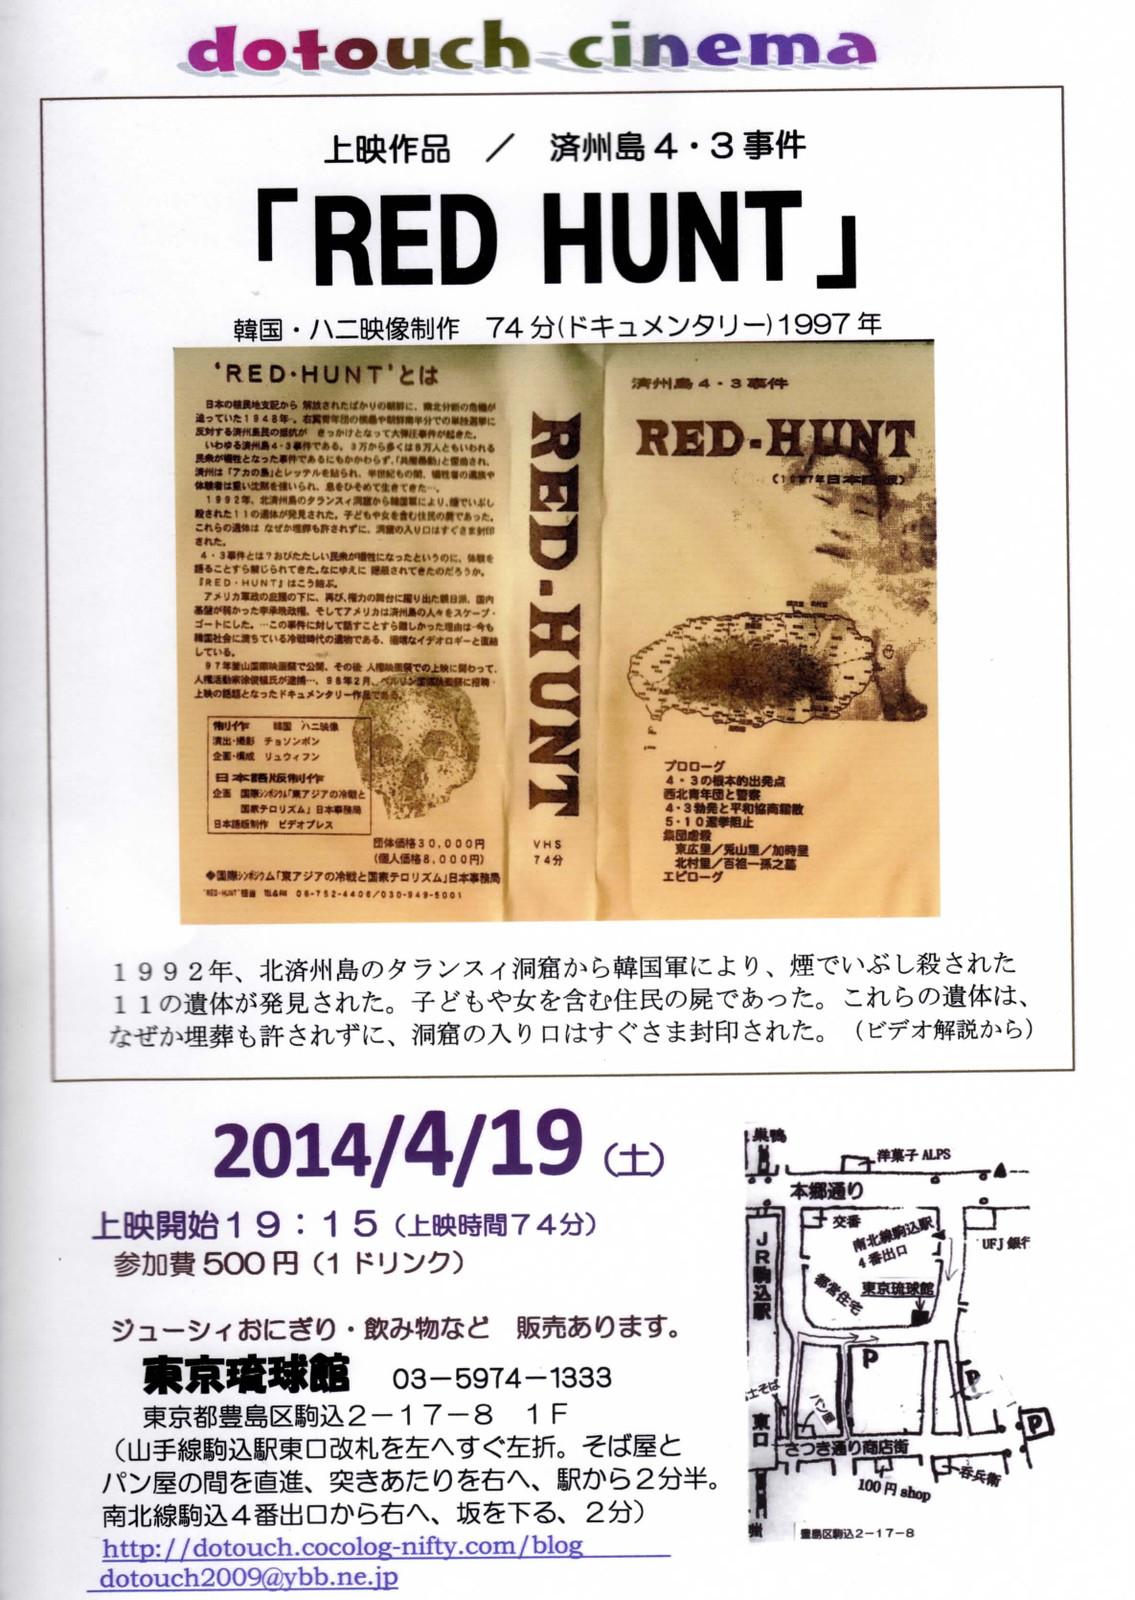 Red_hunt_2